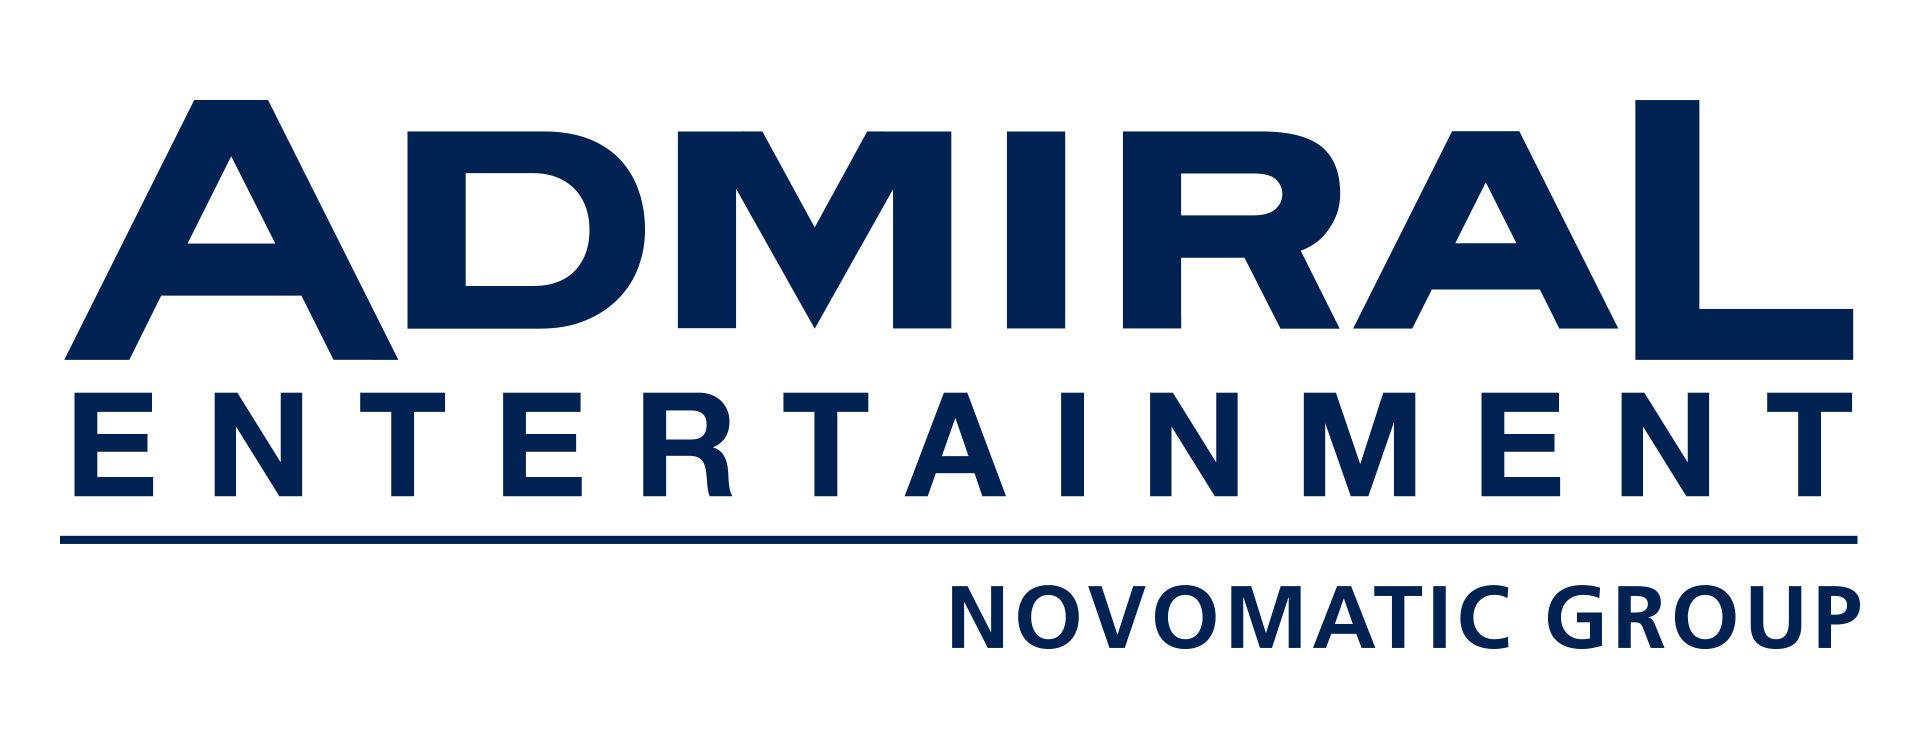 Admiral Entertainment